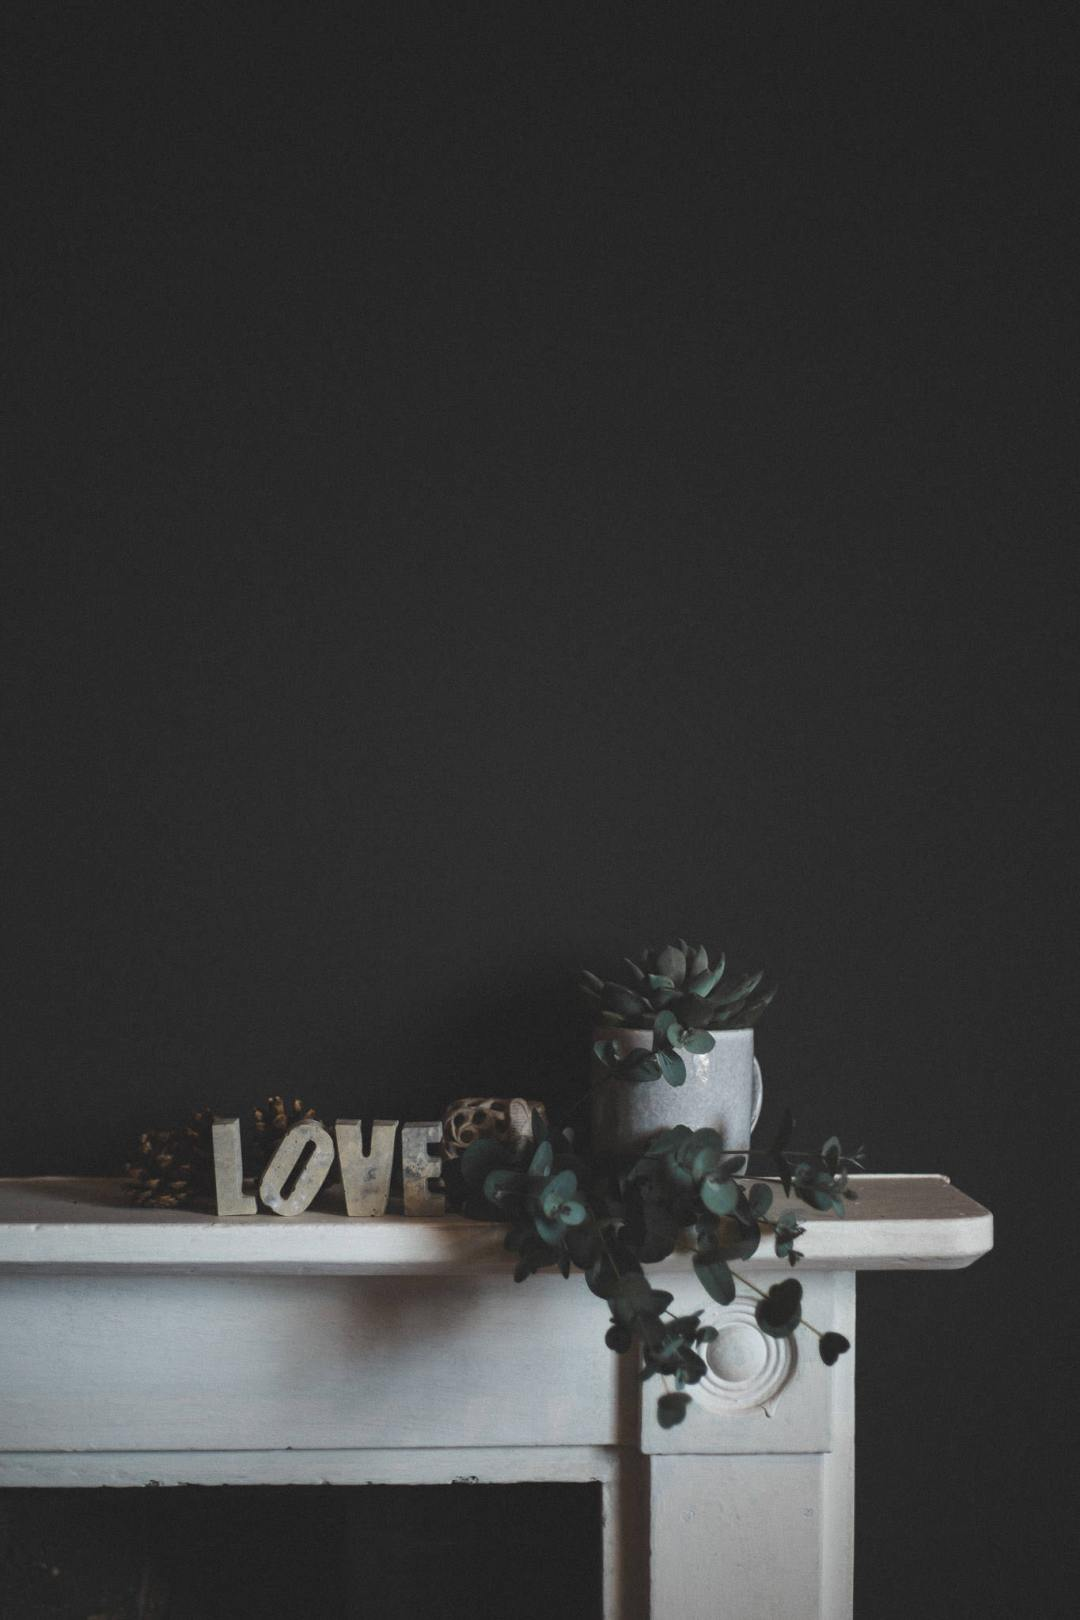 Concrete Letters - LOVE Valentines